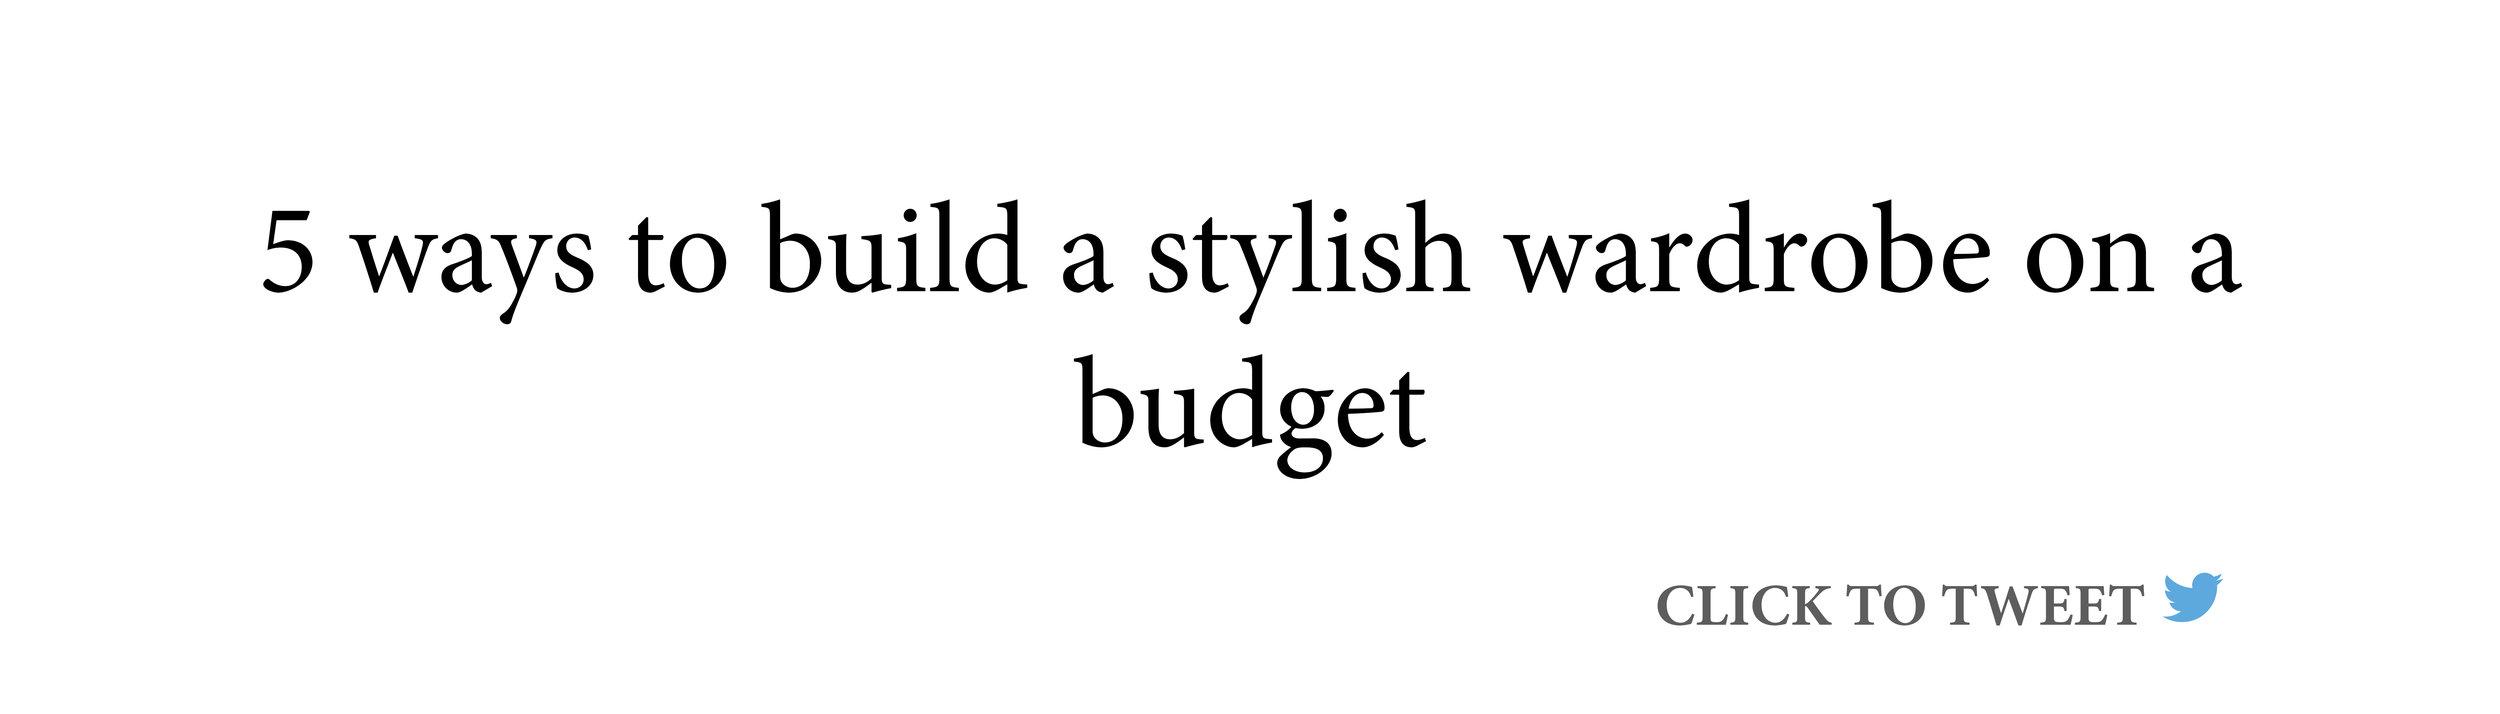 5-ways-to-build-a-wardrobe-on-a-budget-tweet.jpg